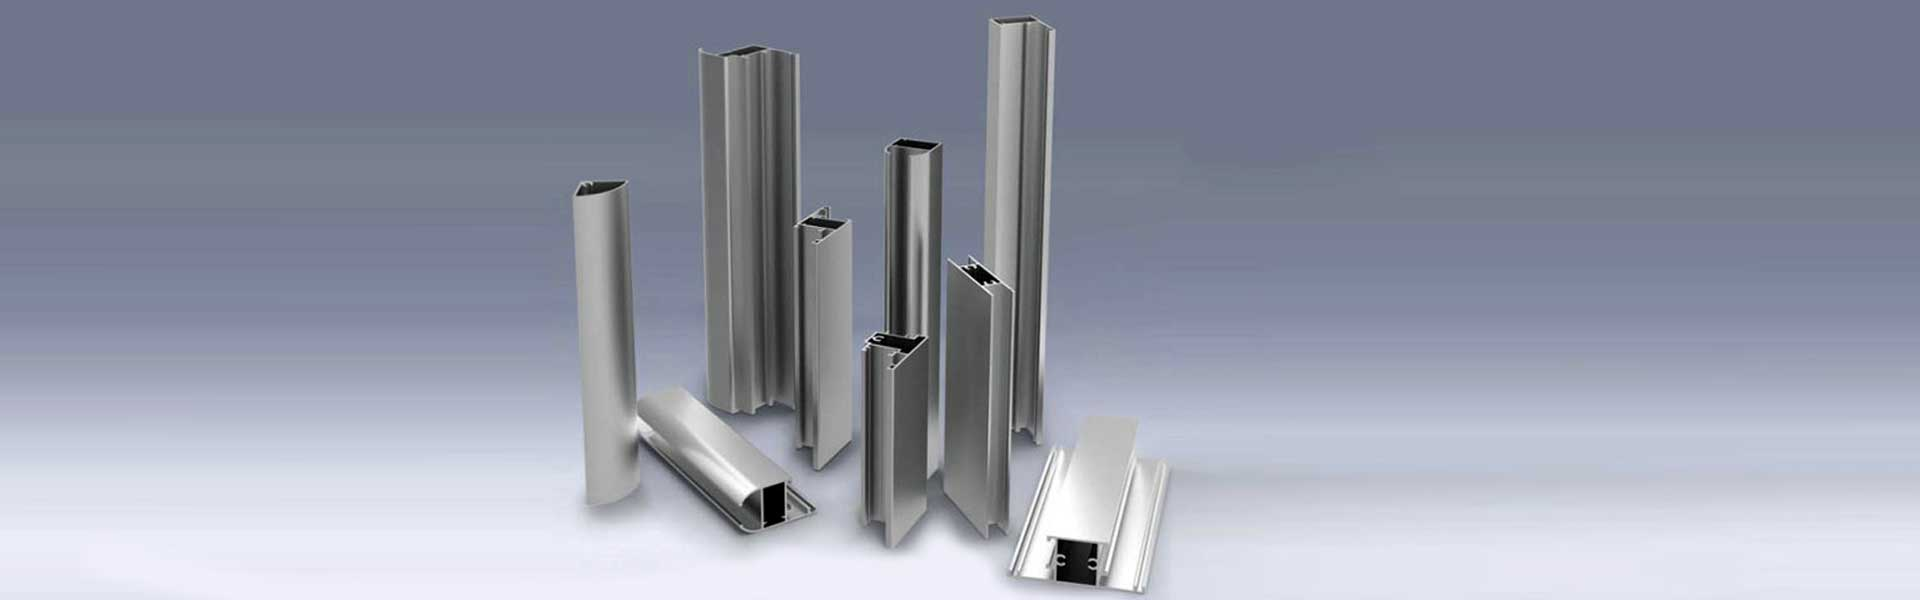 Infissi-Alluminio-hero